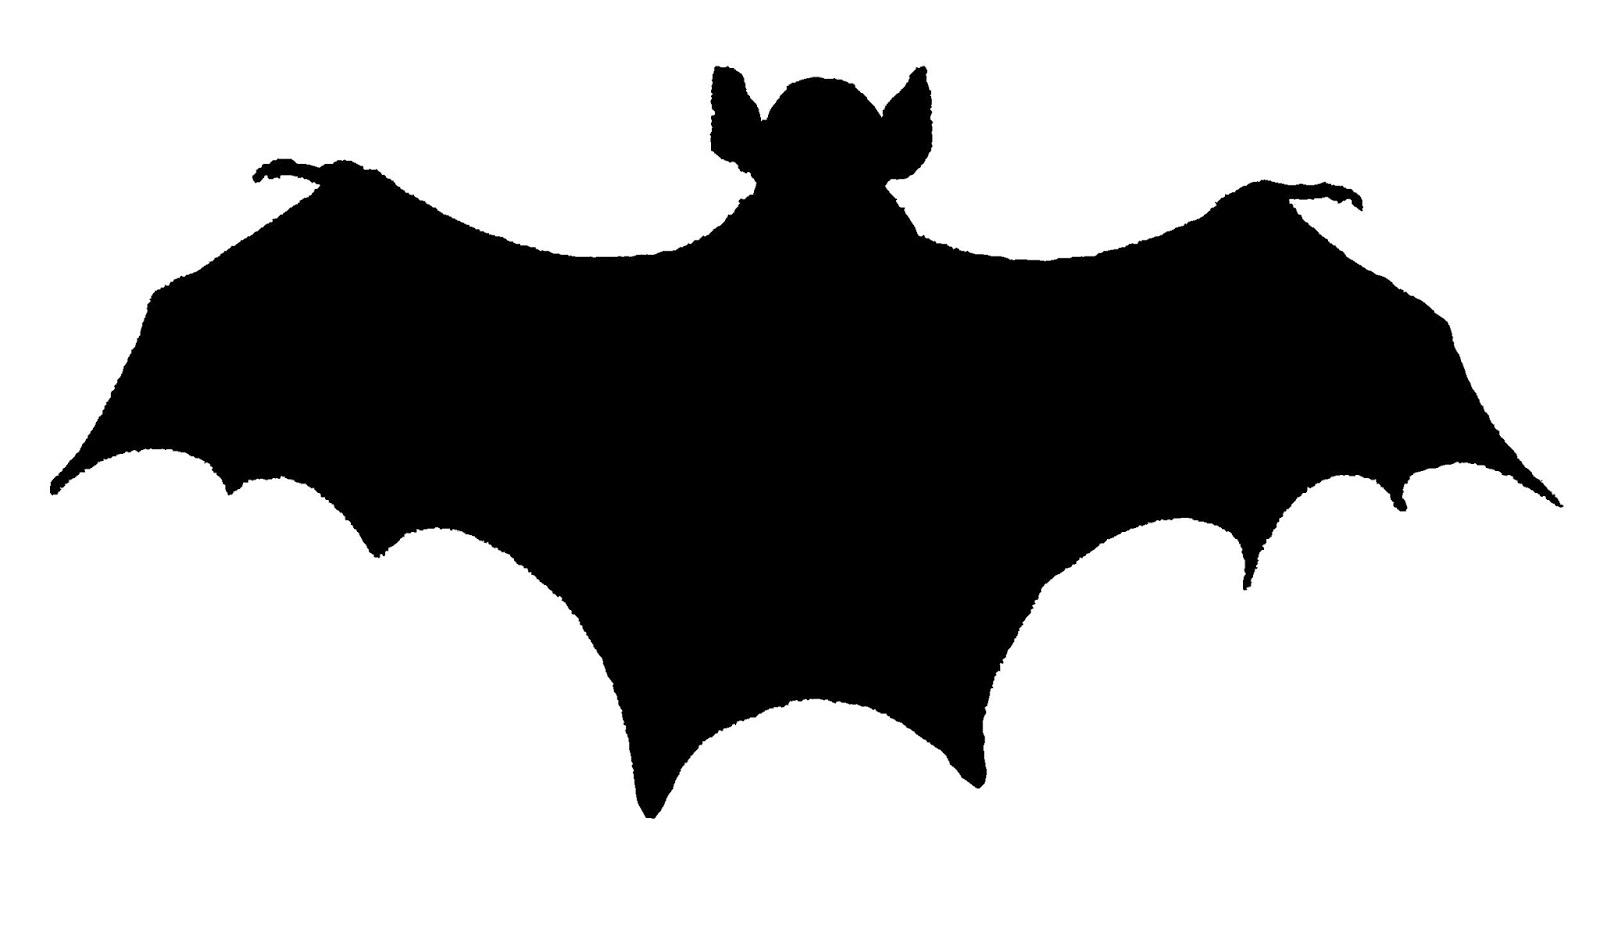 1600x925 Digital Stamp Design Royalty Free Halloween Bat Silhouette